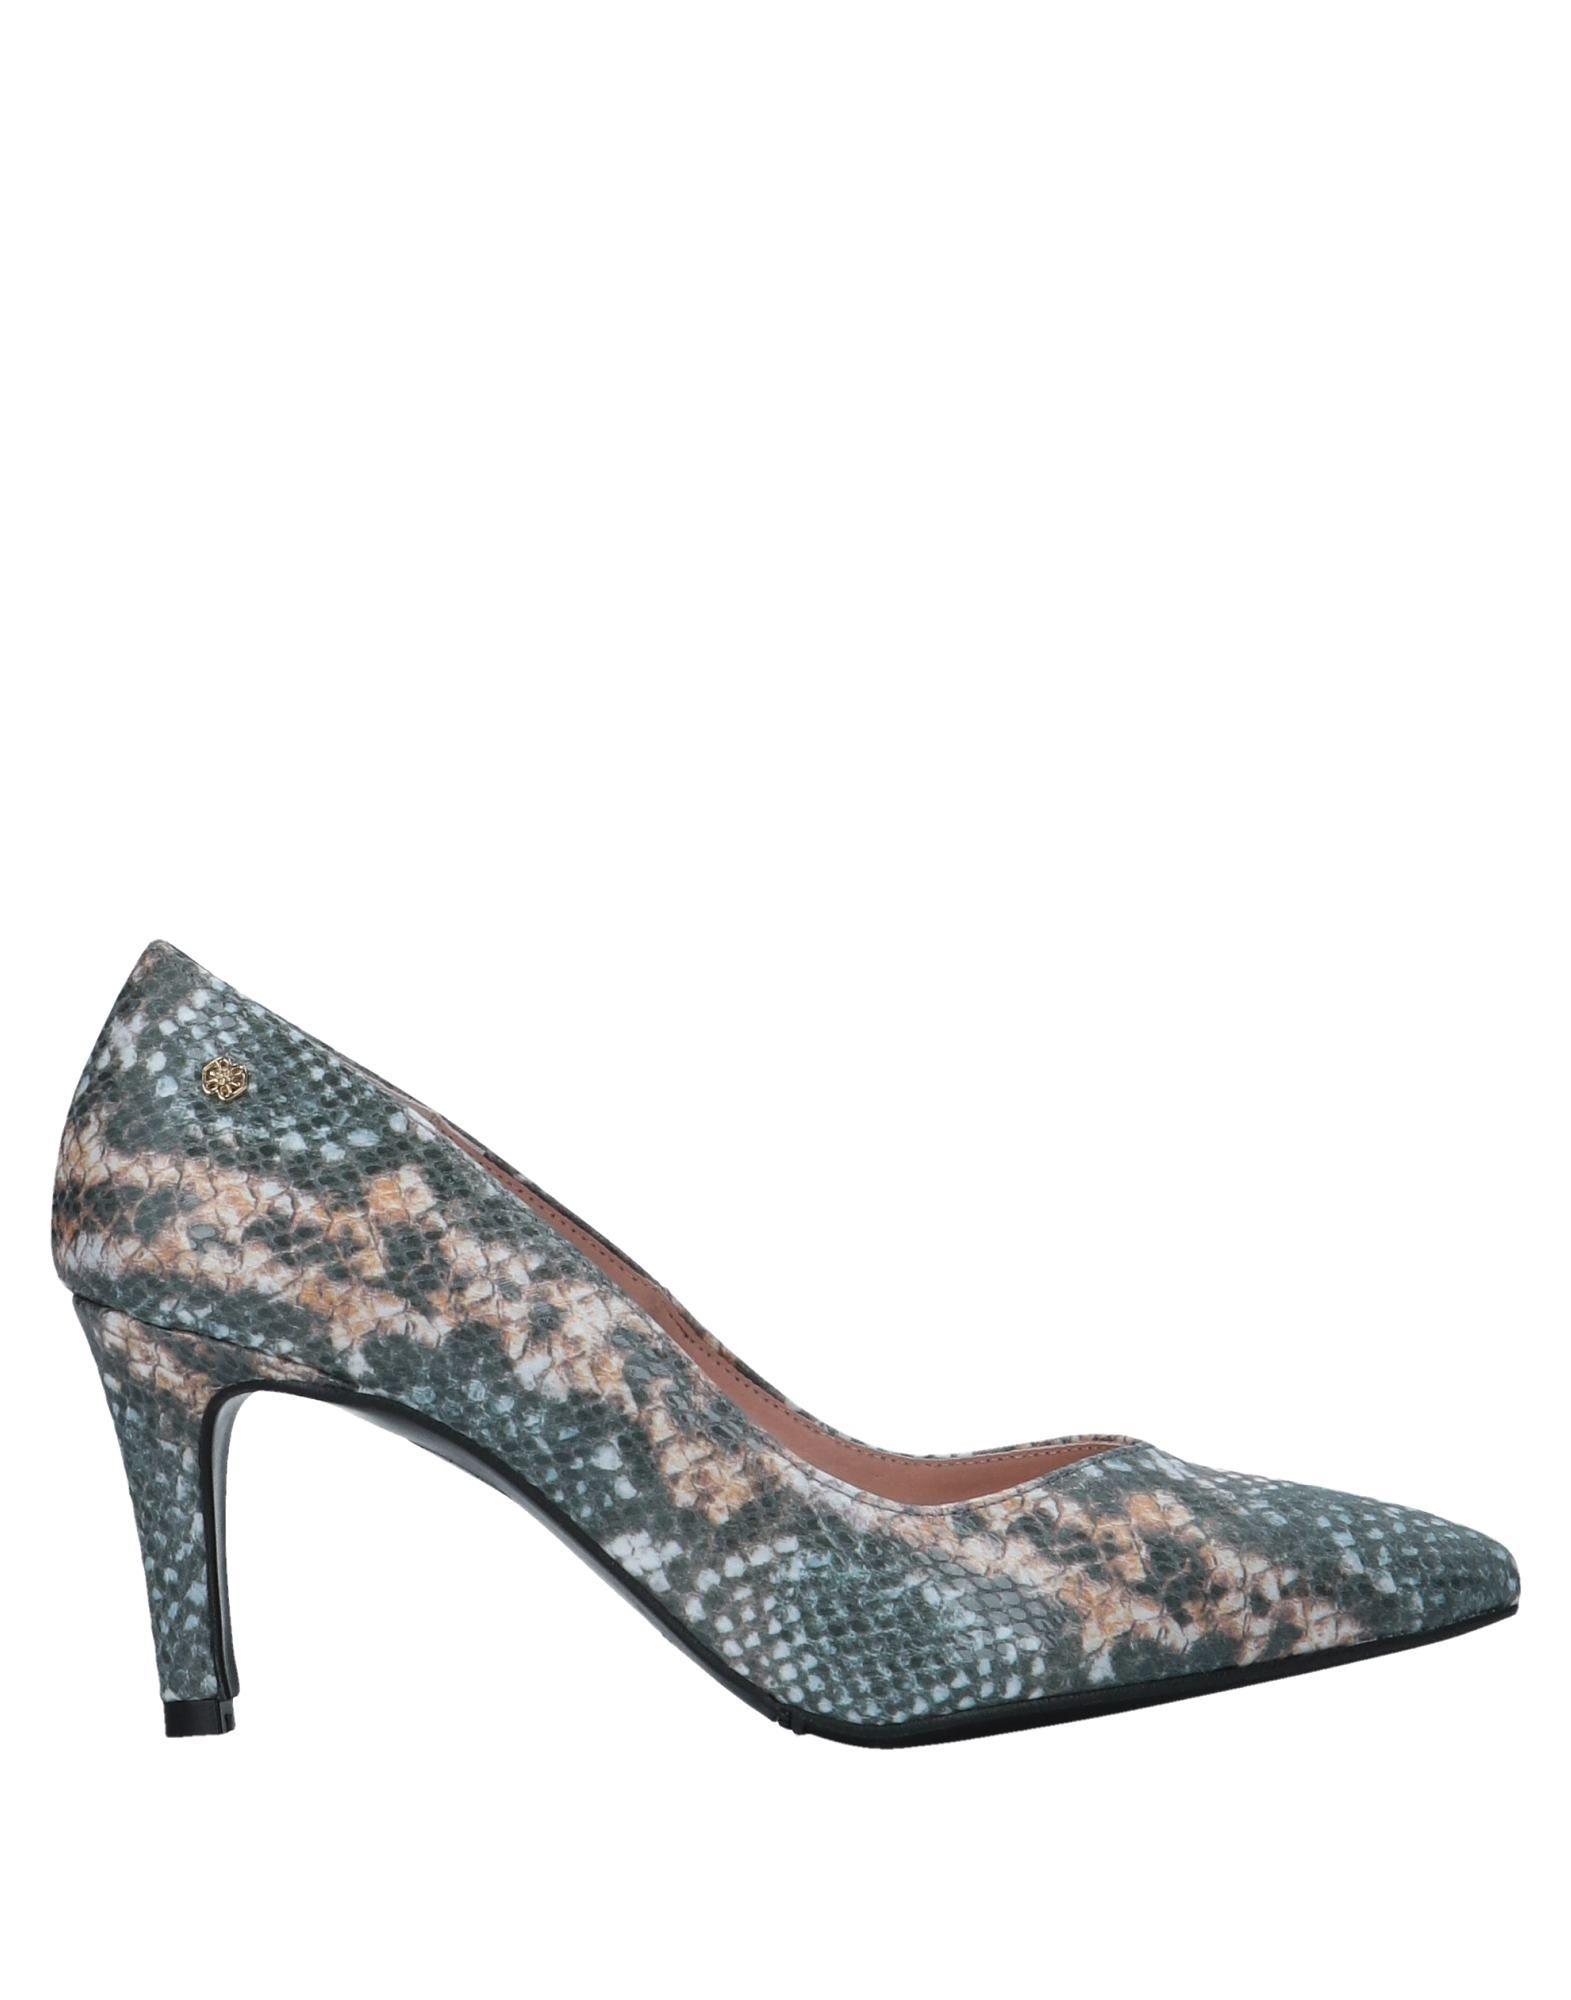 Mocassino Chocolà offerte Donna - 11528446MT Nuove offerte Chocolà e scarpe comode 235584